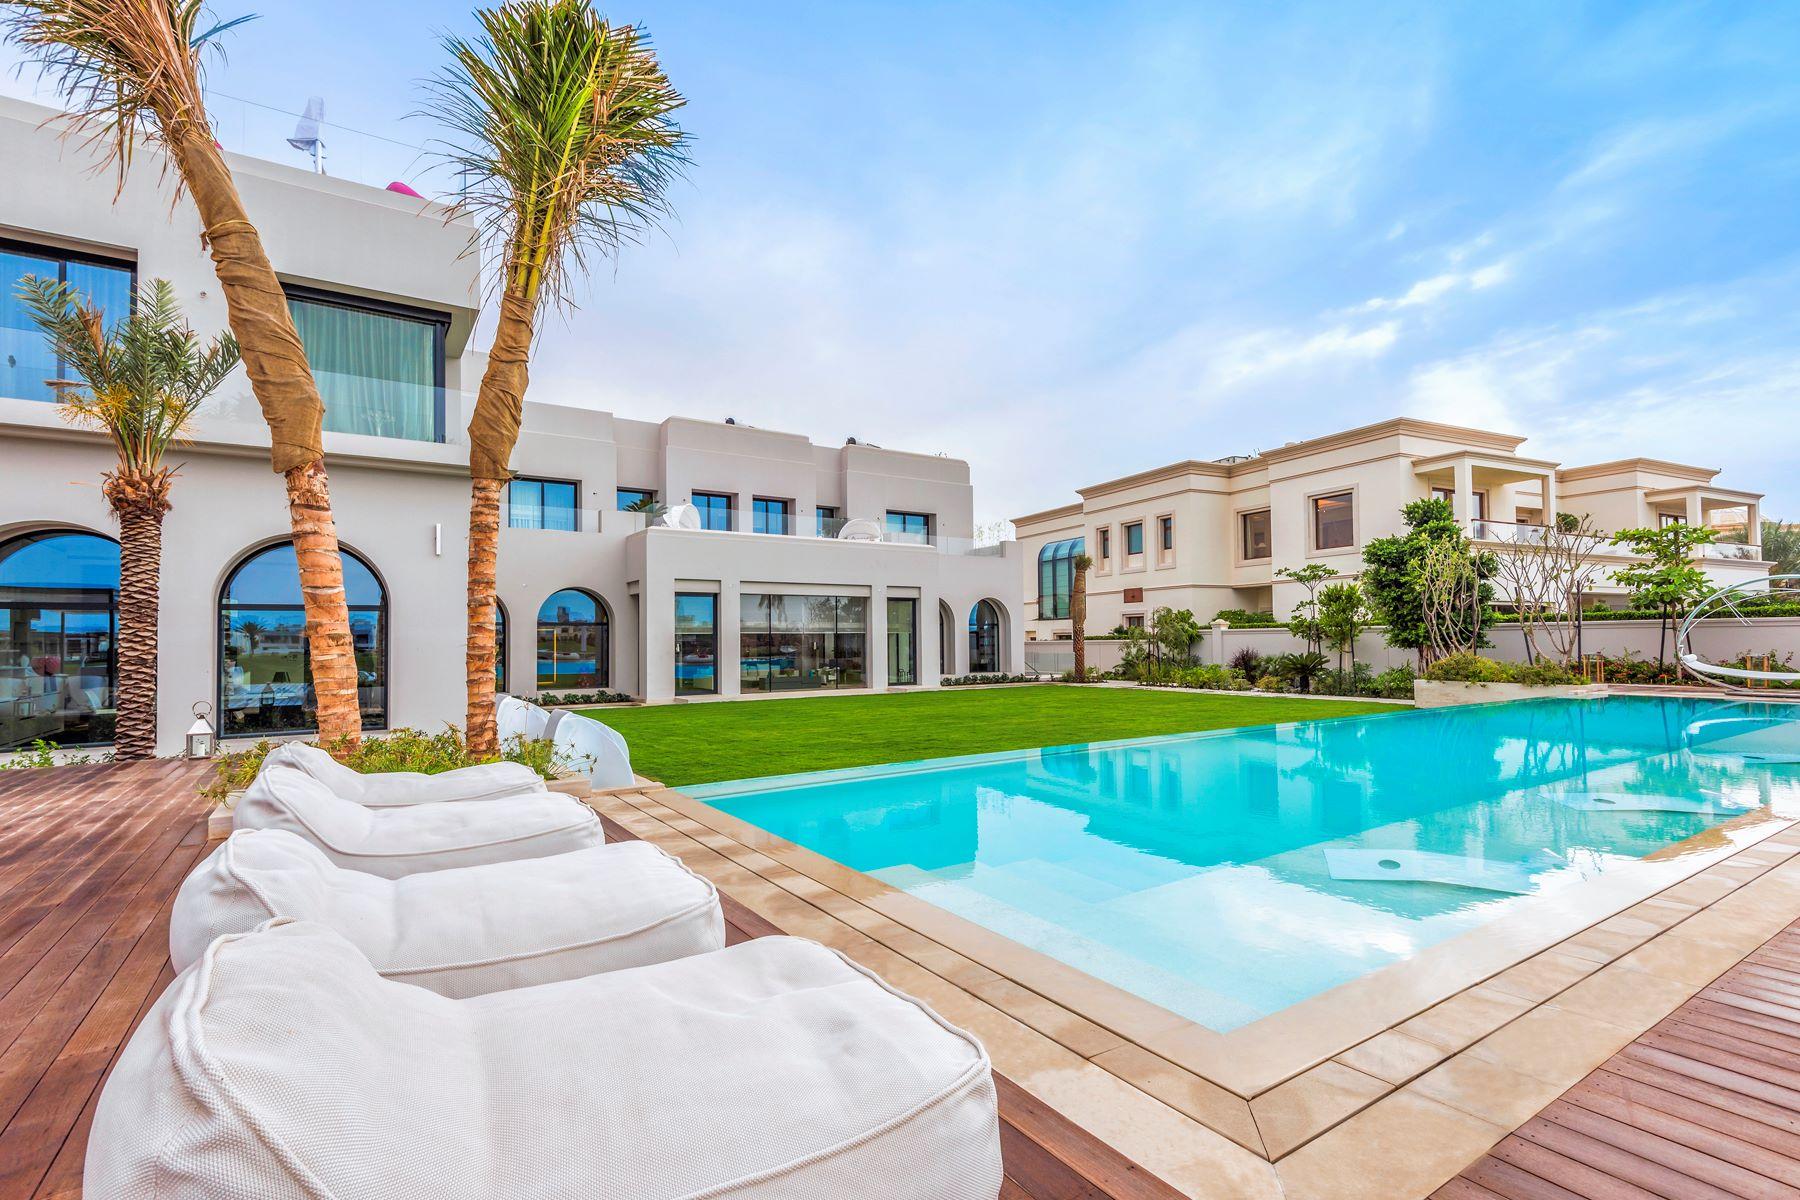 Multi-Family Home for Sale at Golf Course View - Emirates Hills Emirates Hills, Dubai, United Arab Emirates